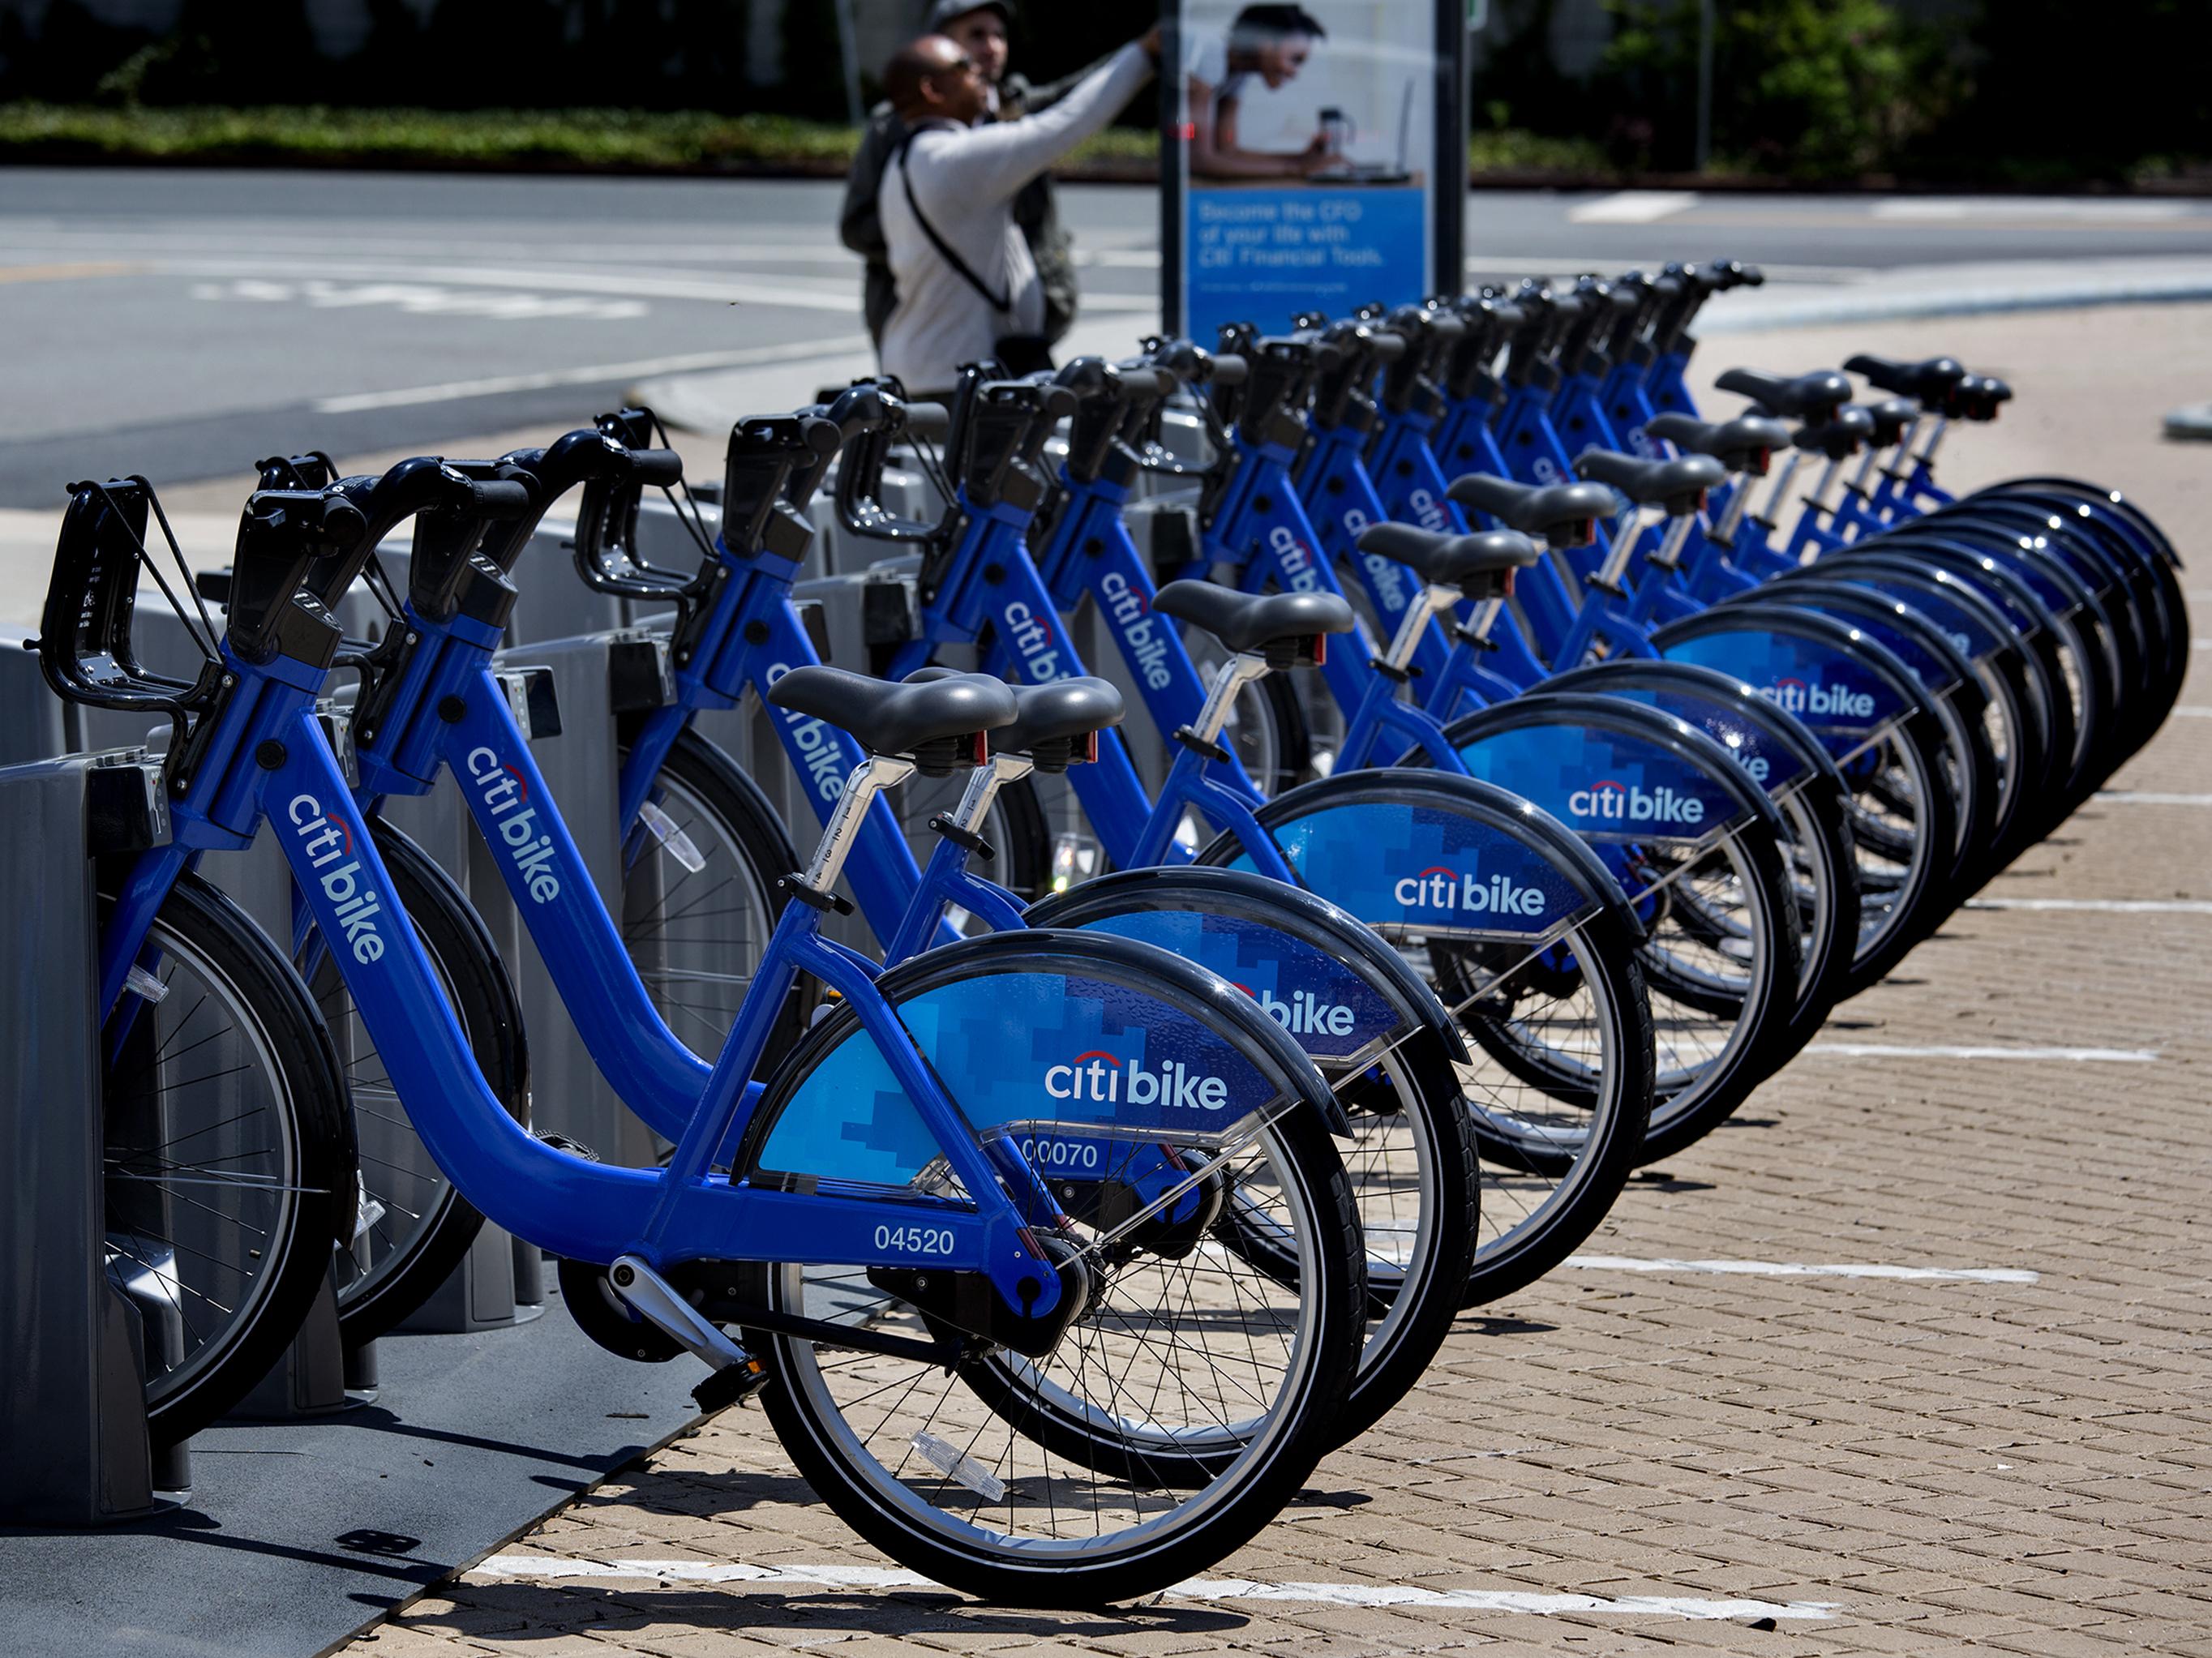 Bike-Sharing Programs Roll Into Cities Across The U.S.